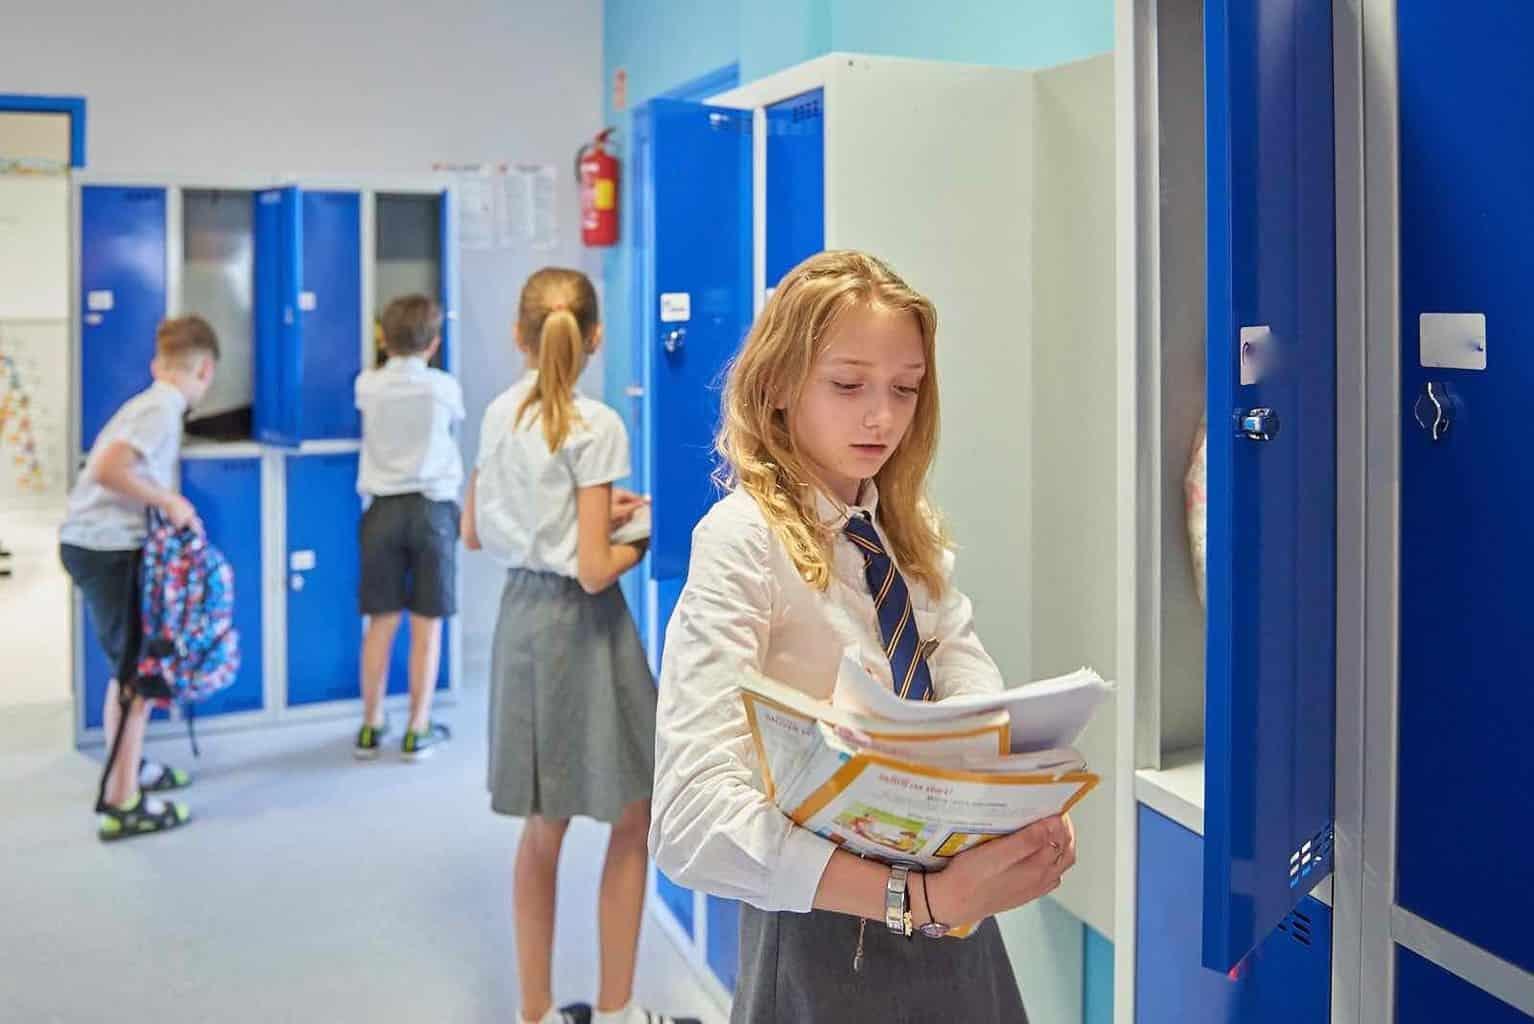 The British Primary School of Wilanow Warsaw Poland